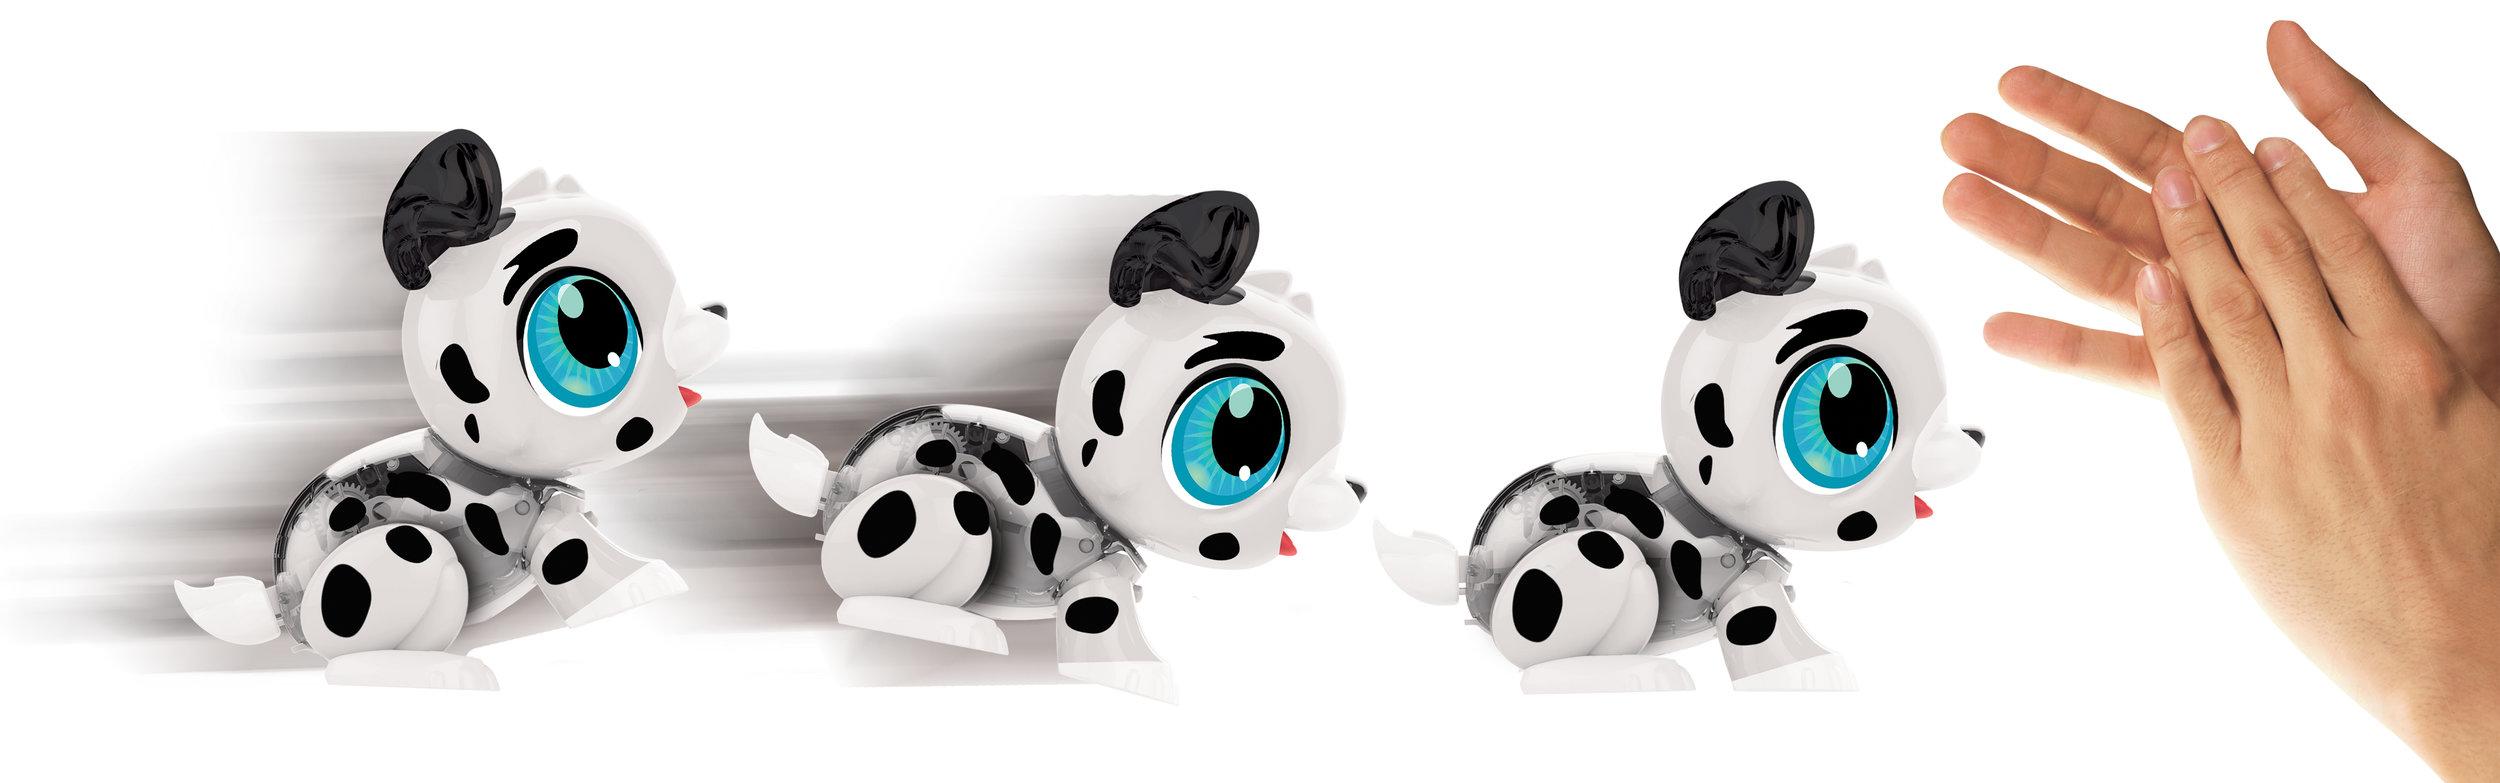 Image 7 Dalmatian - Clap and Move - hi-res.jpg